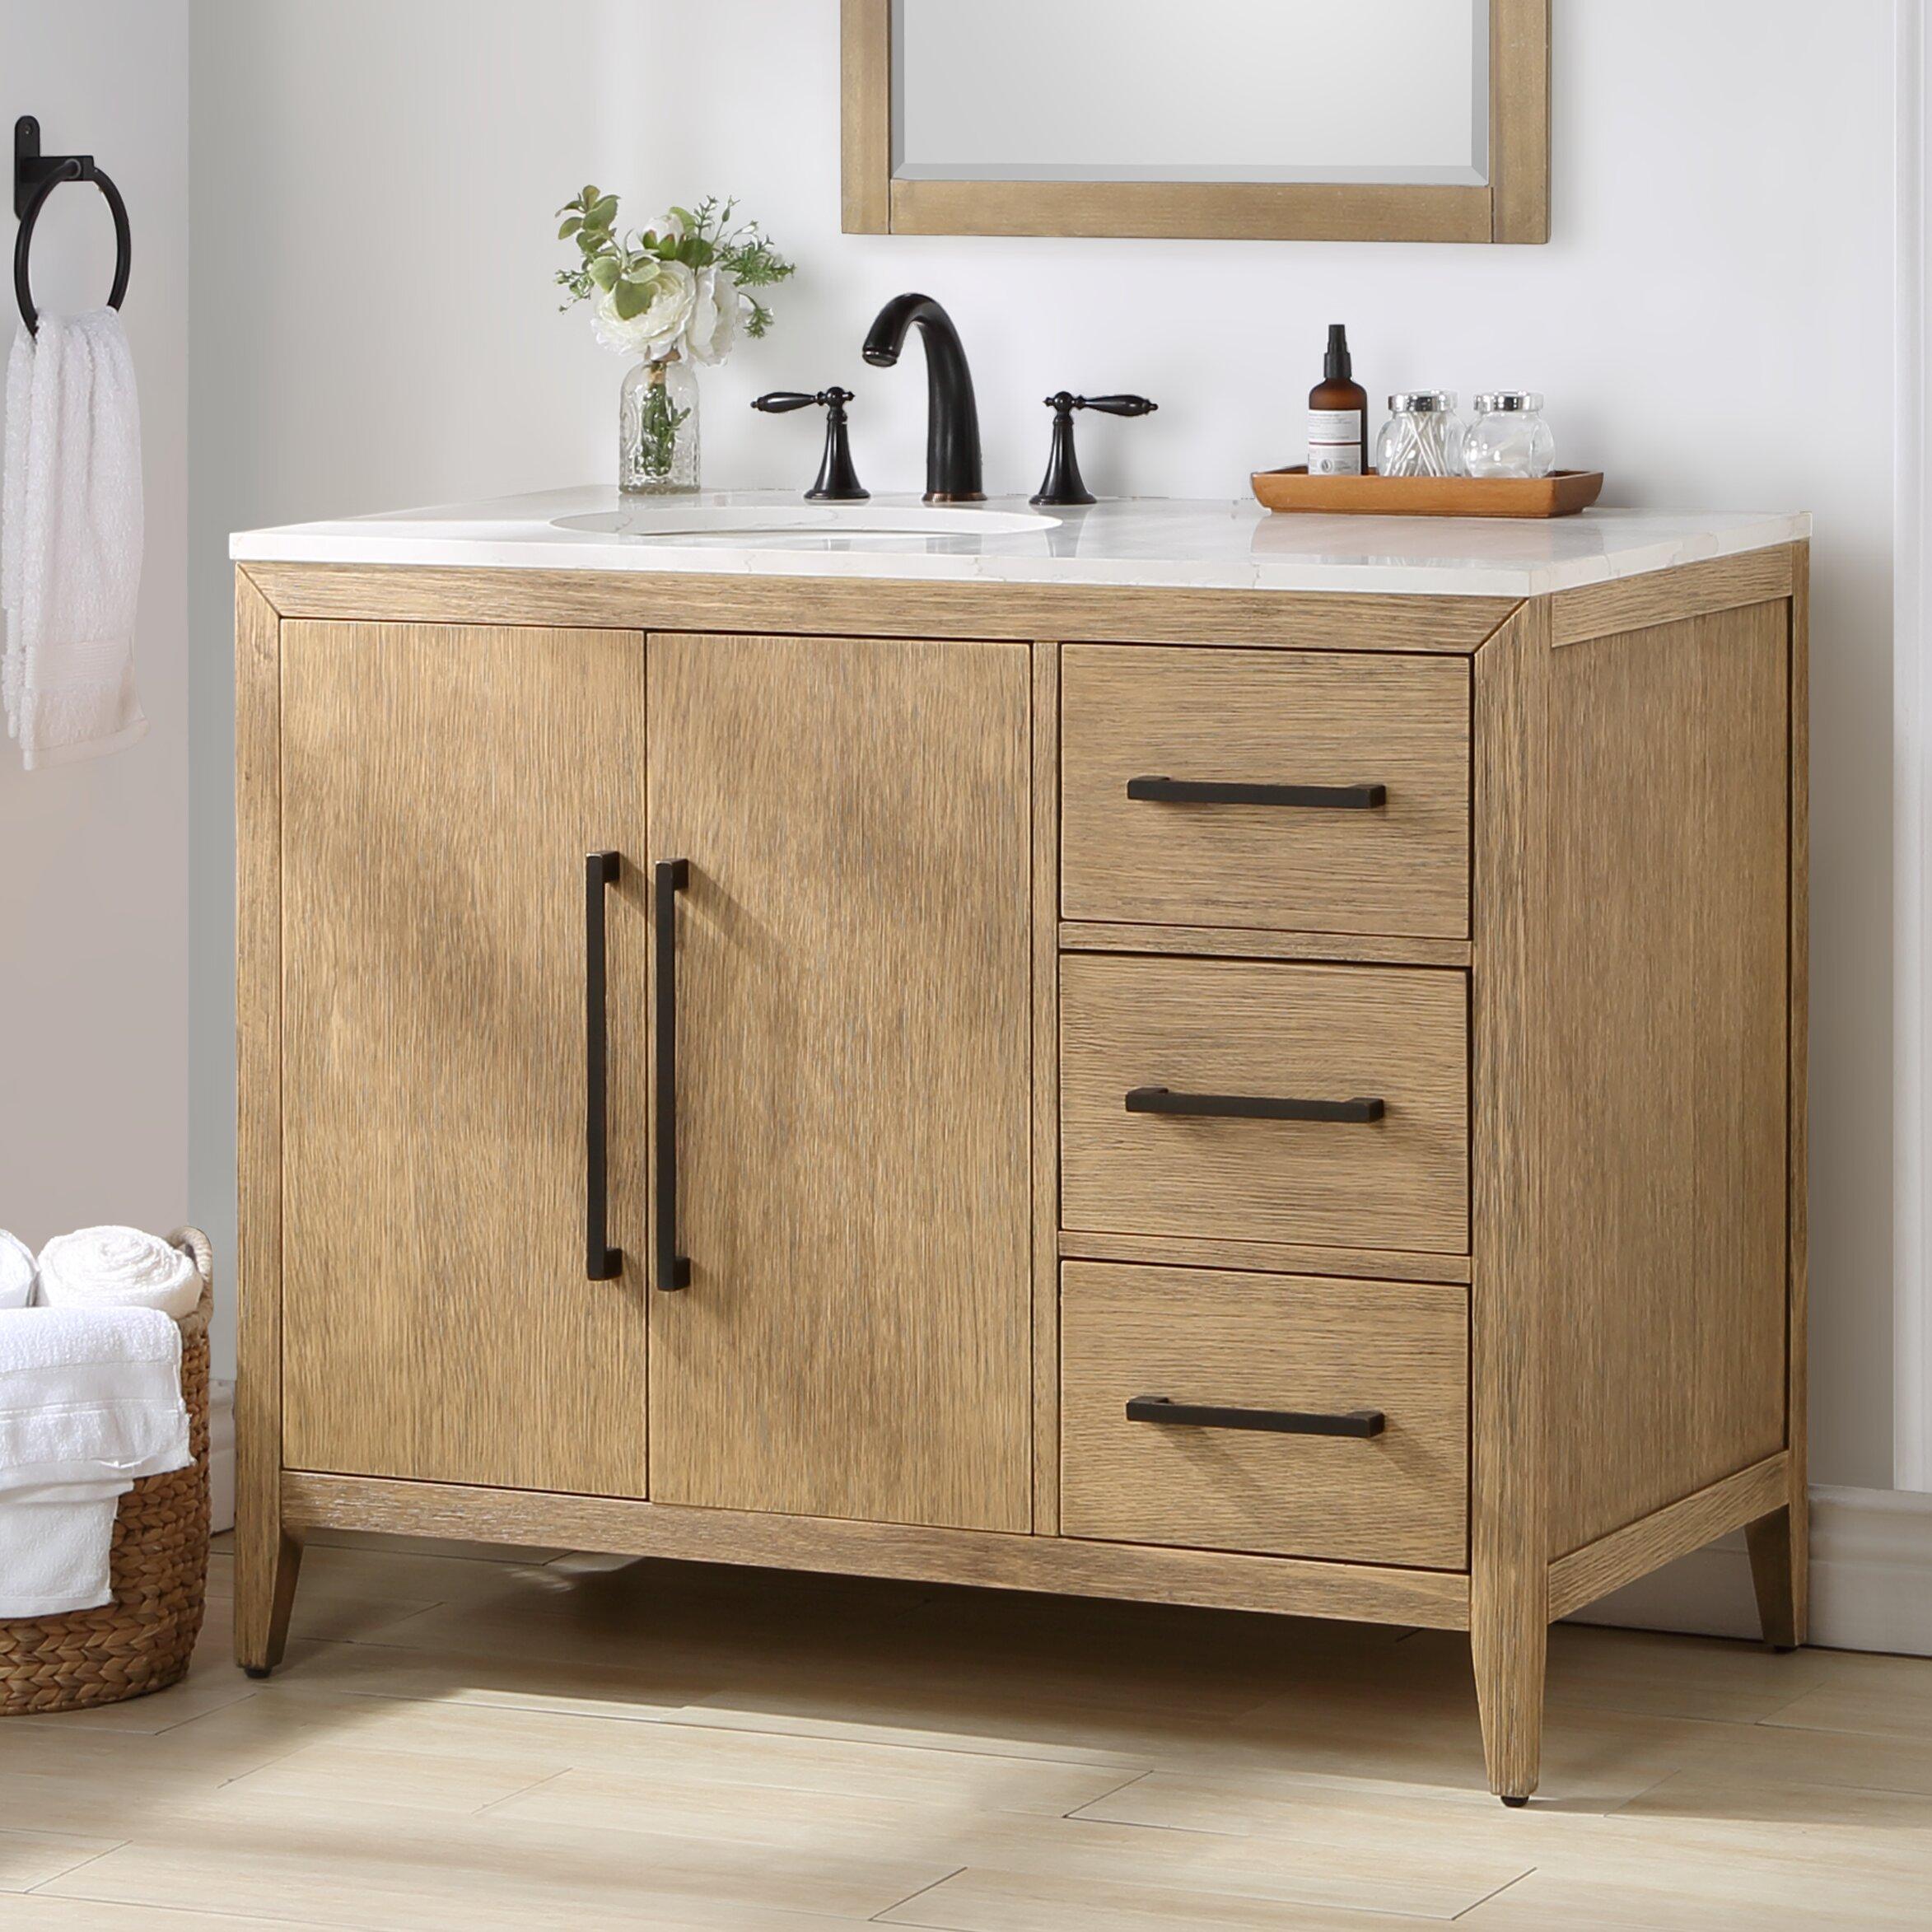 Highbury Furnishings Chiswick 42 Single Bathroom Vanity Wayfair